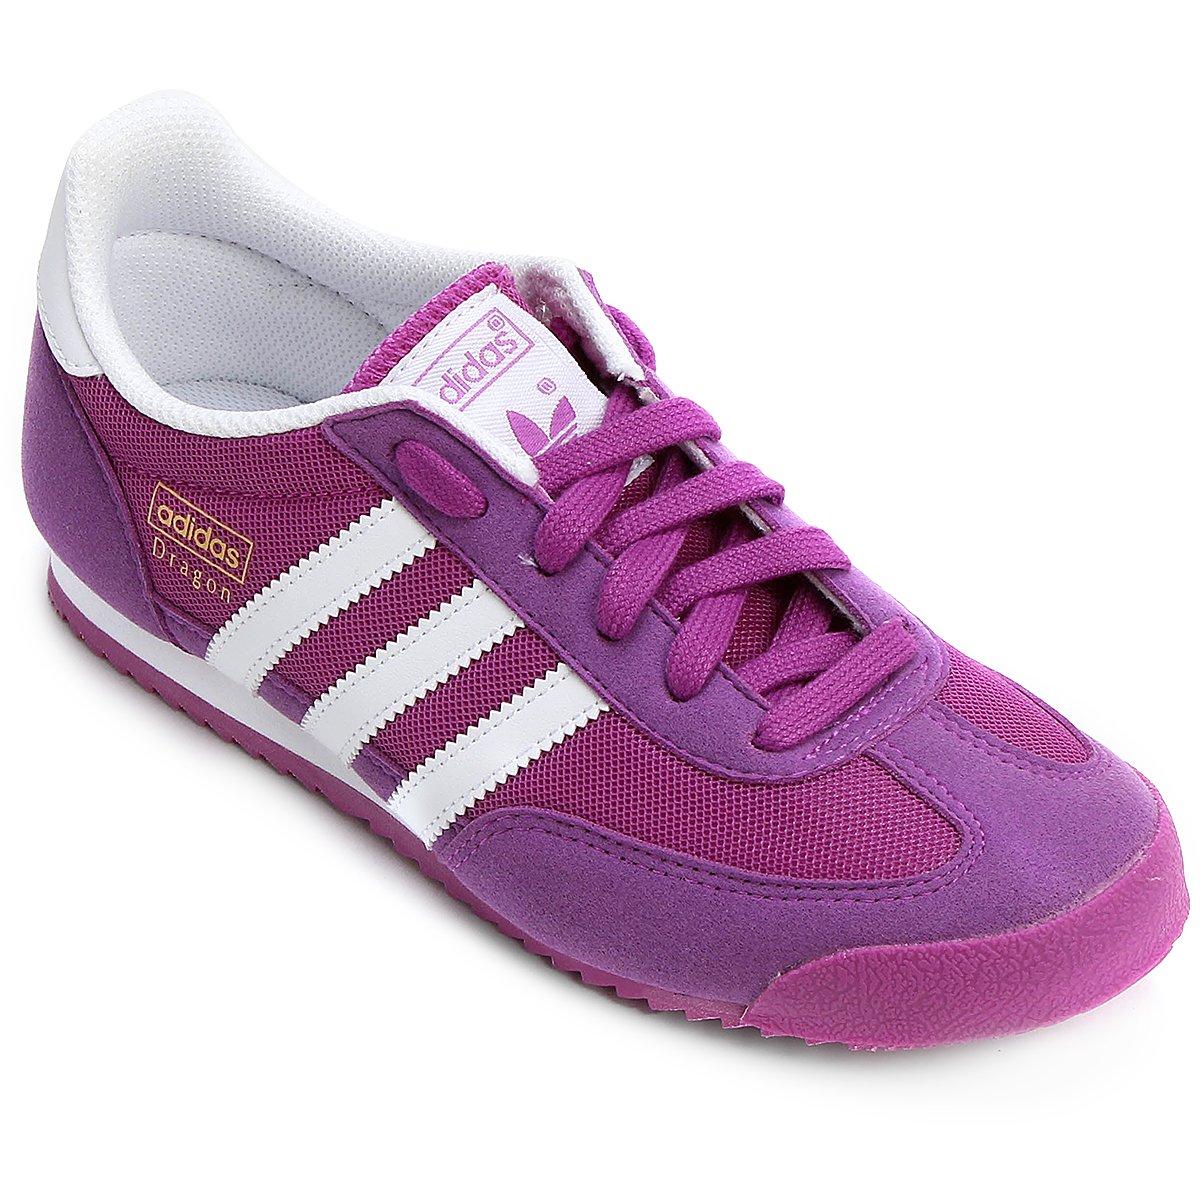 tenis adidas dragon rosa